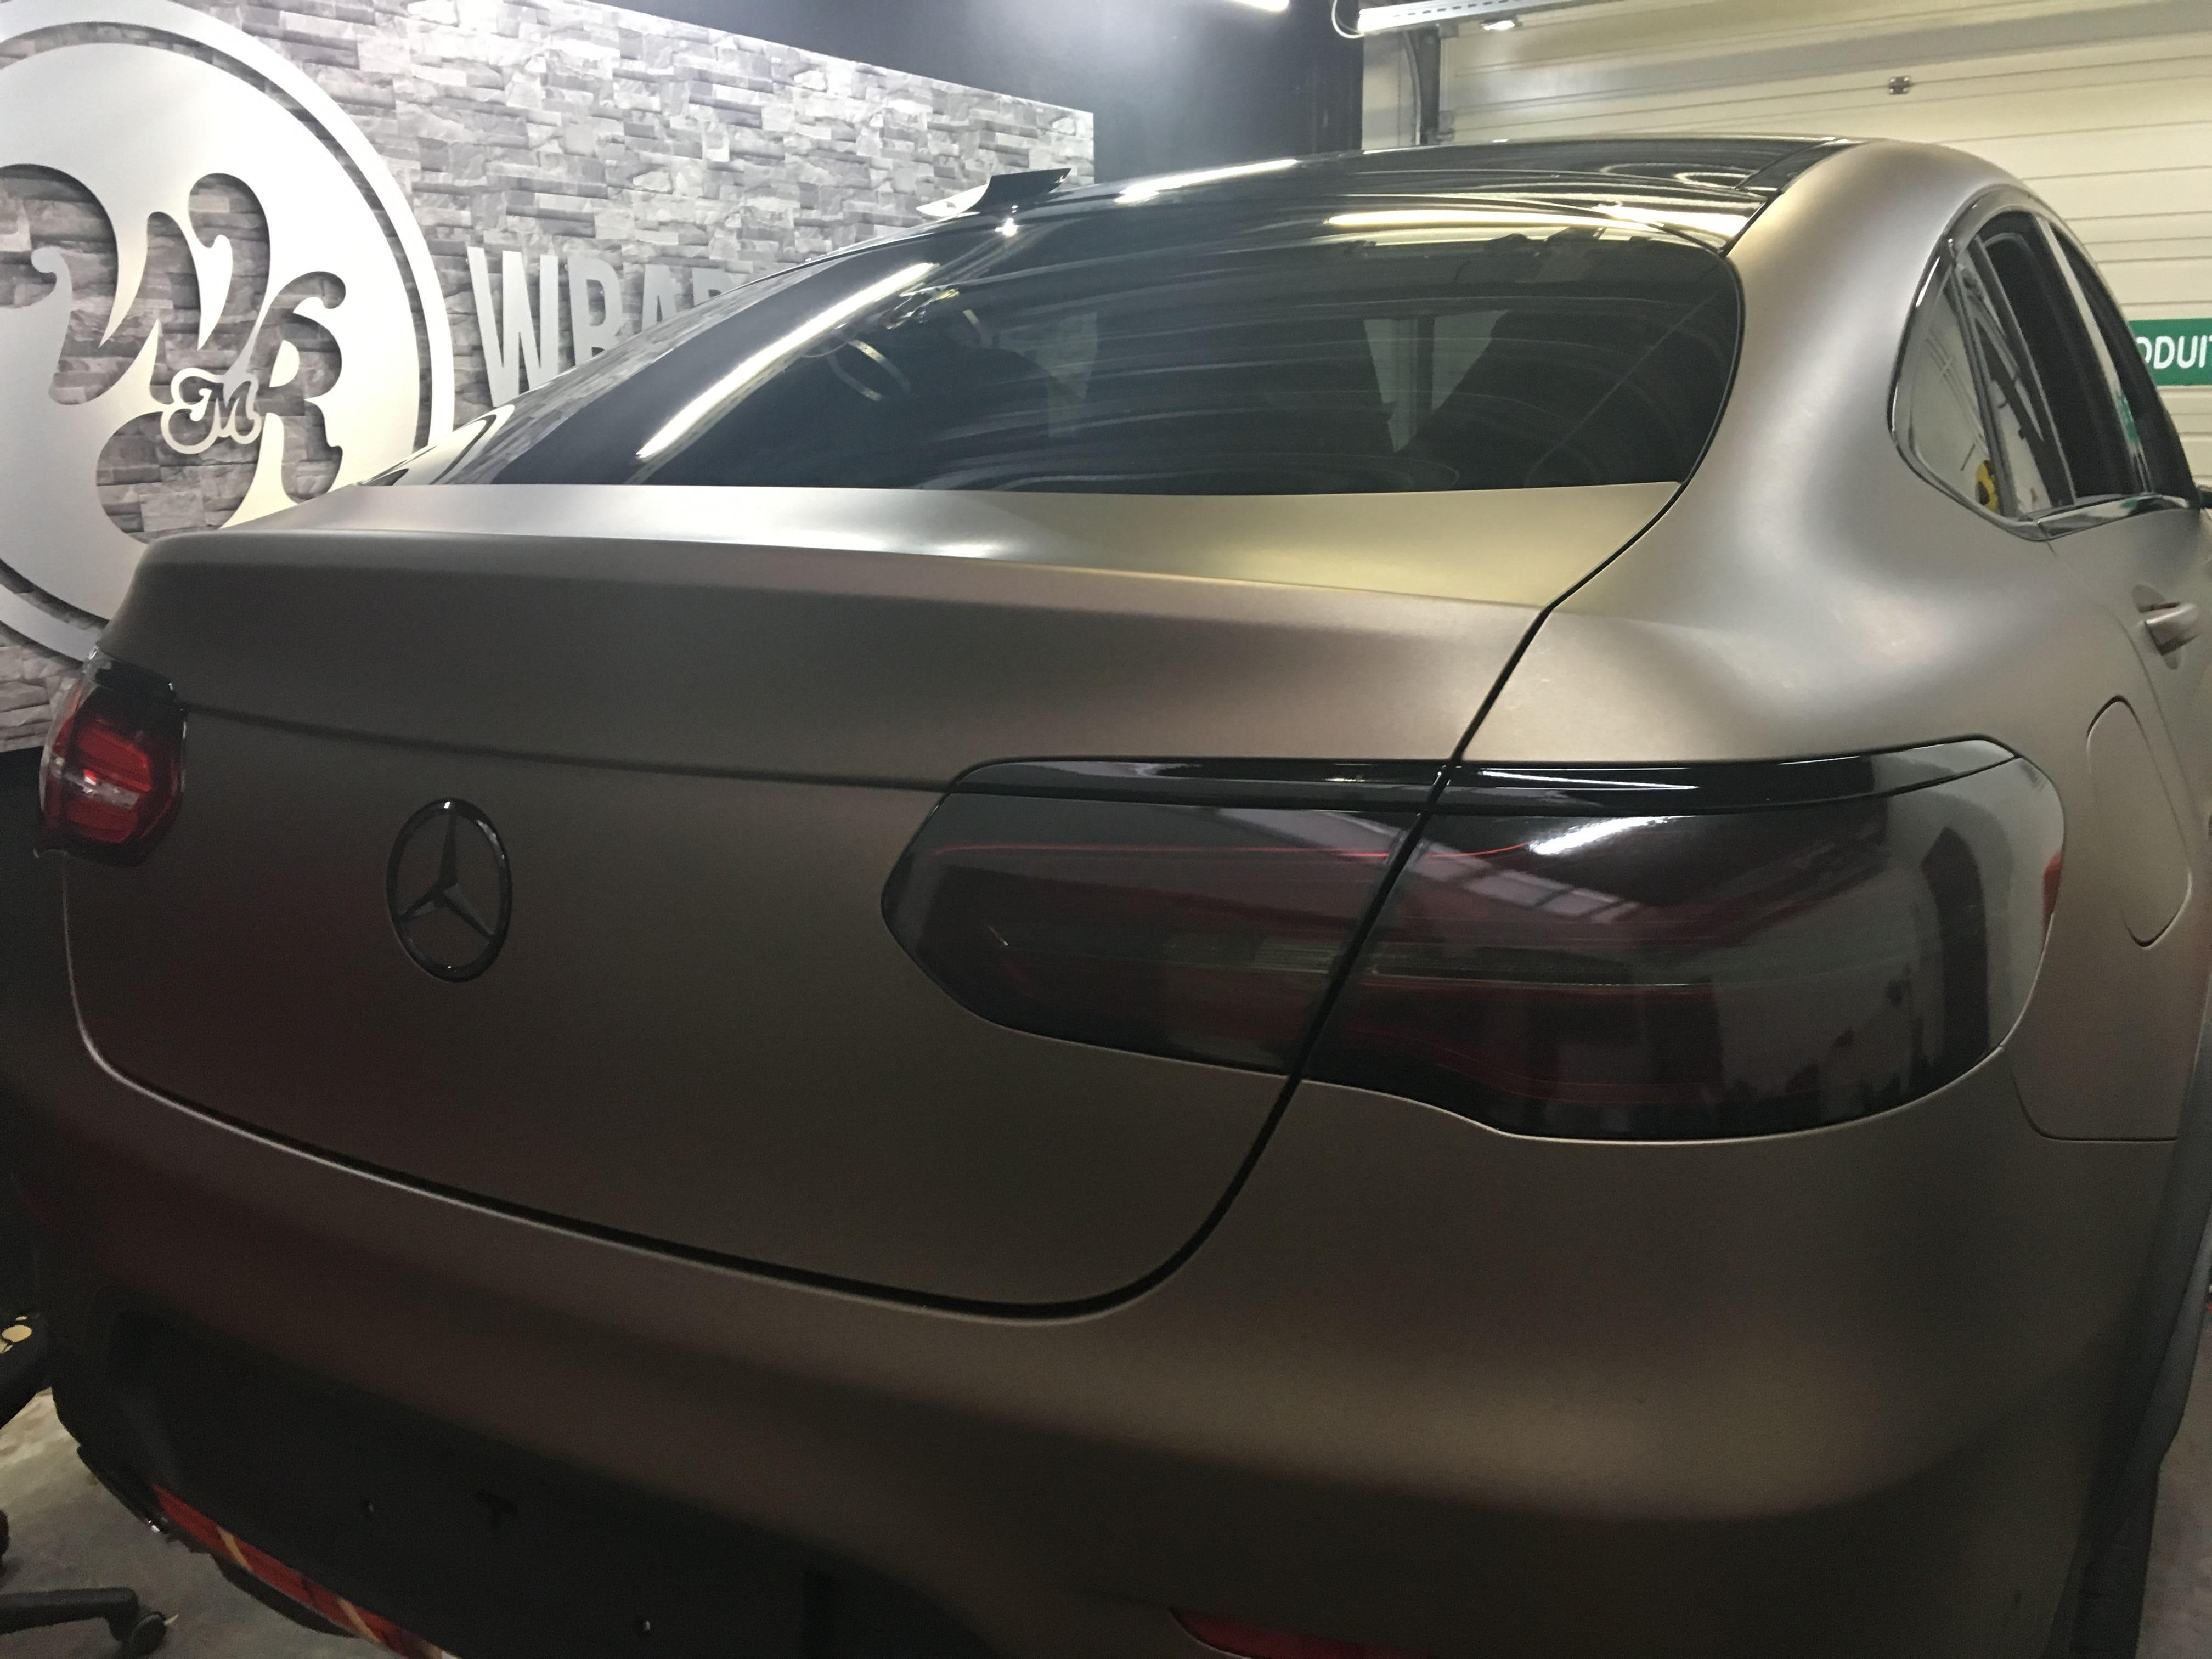 Mercedes GLC Coupe Matte metallic brown, Carwrapping door Wrapmyride.nu Foto-nr:9369, ©2021